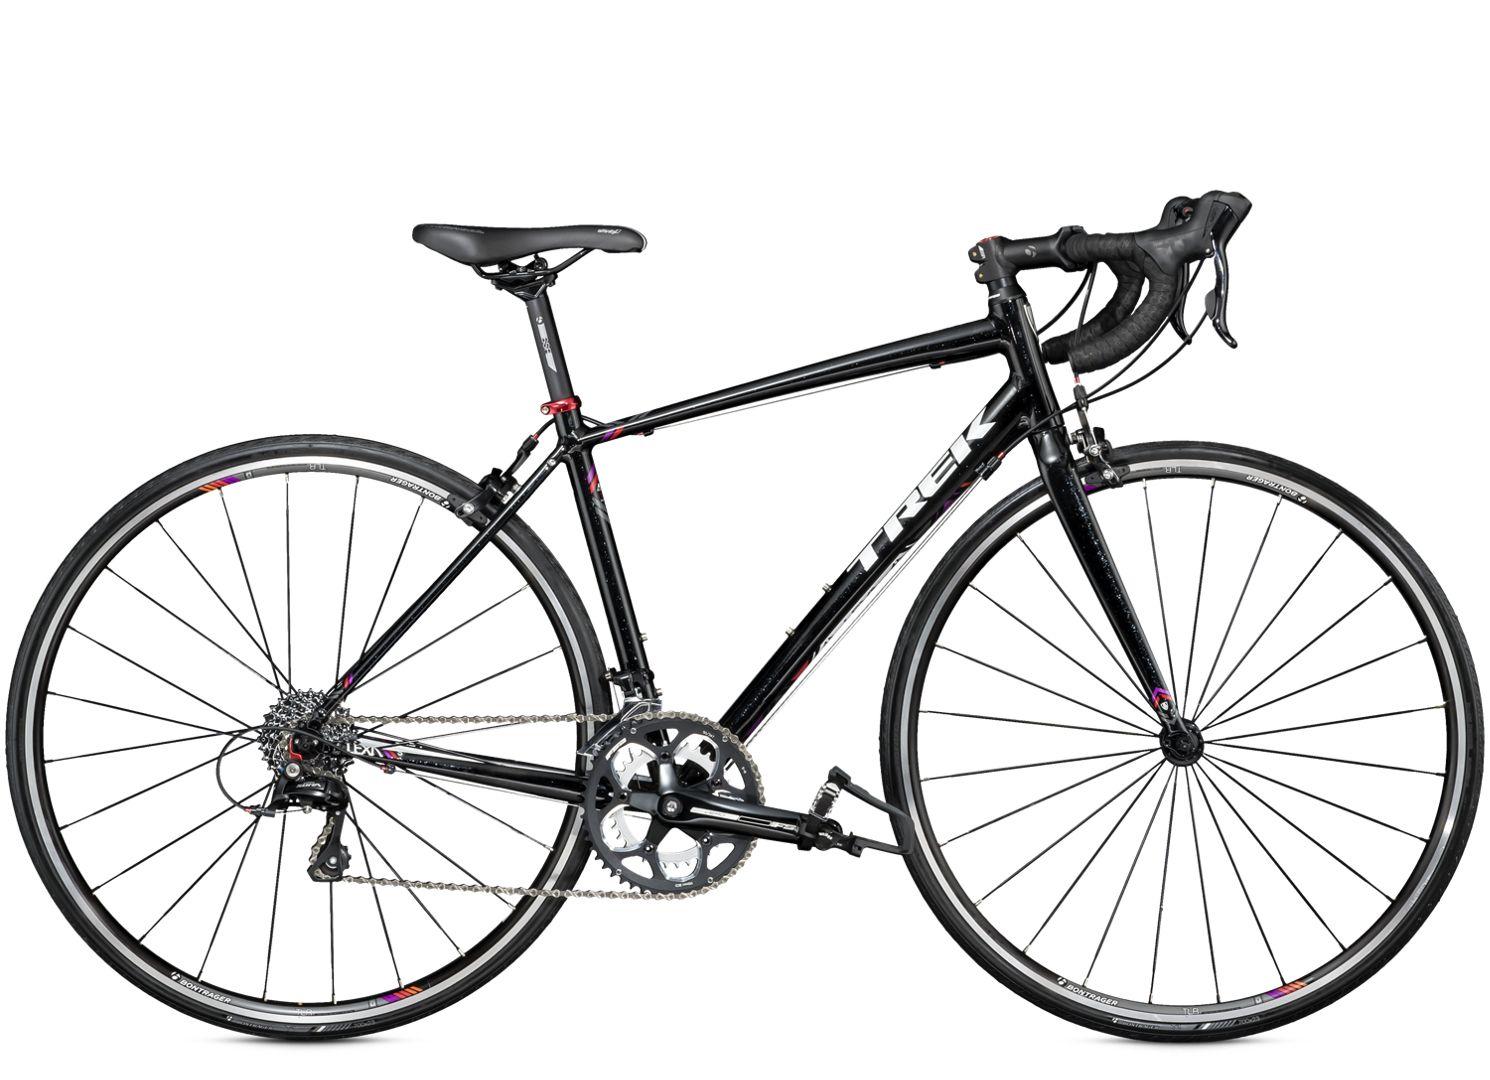 480c42f4e78 Trek Lexa S Seaglass Black Pearl 2015 | Trek Ladies Road Bikes 2015 ...